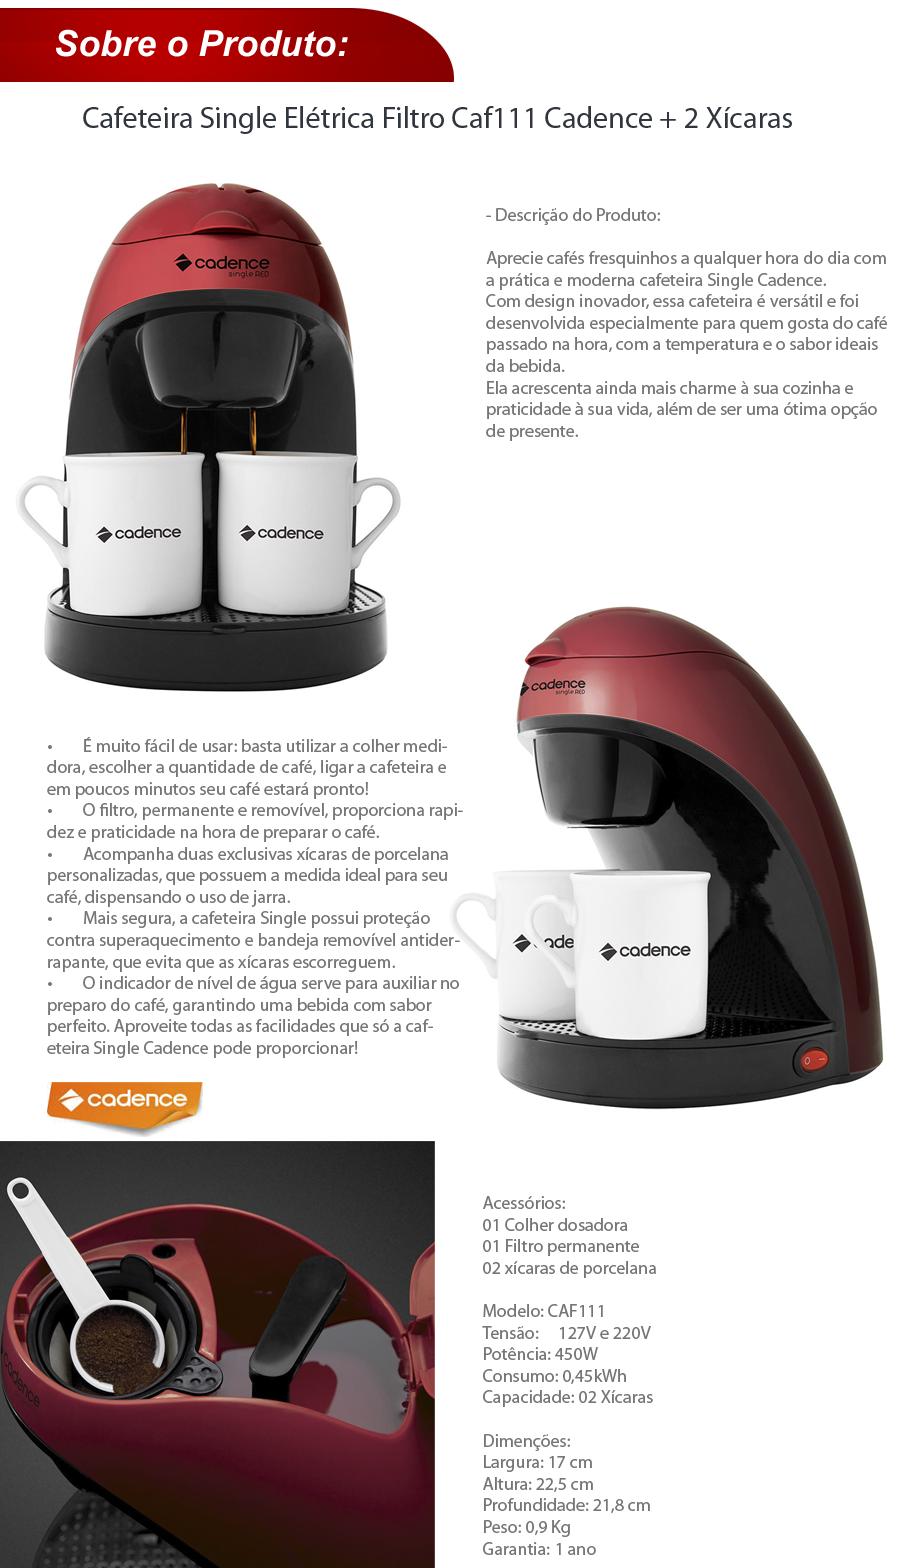 Cafeteira Single Elétrica Filtro Caf111 Cadence + 2 Xícaras